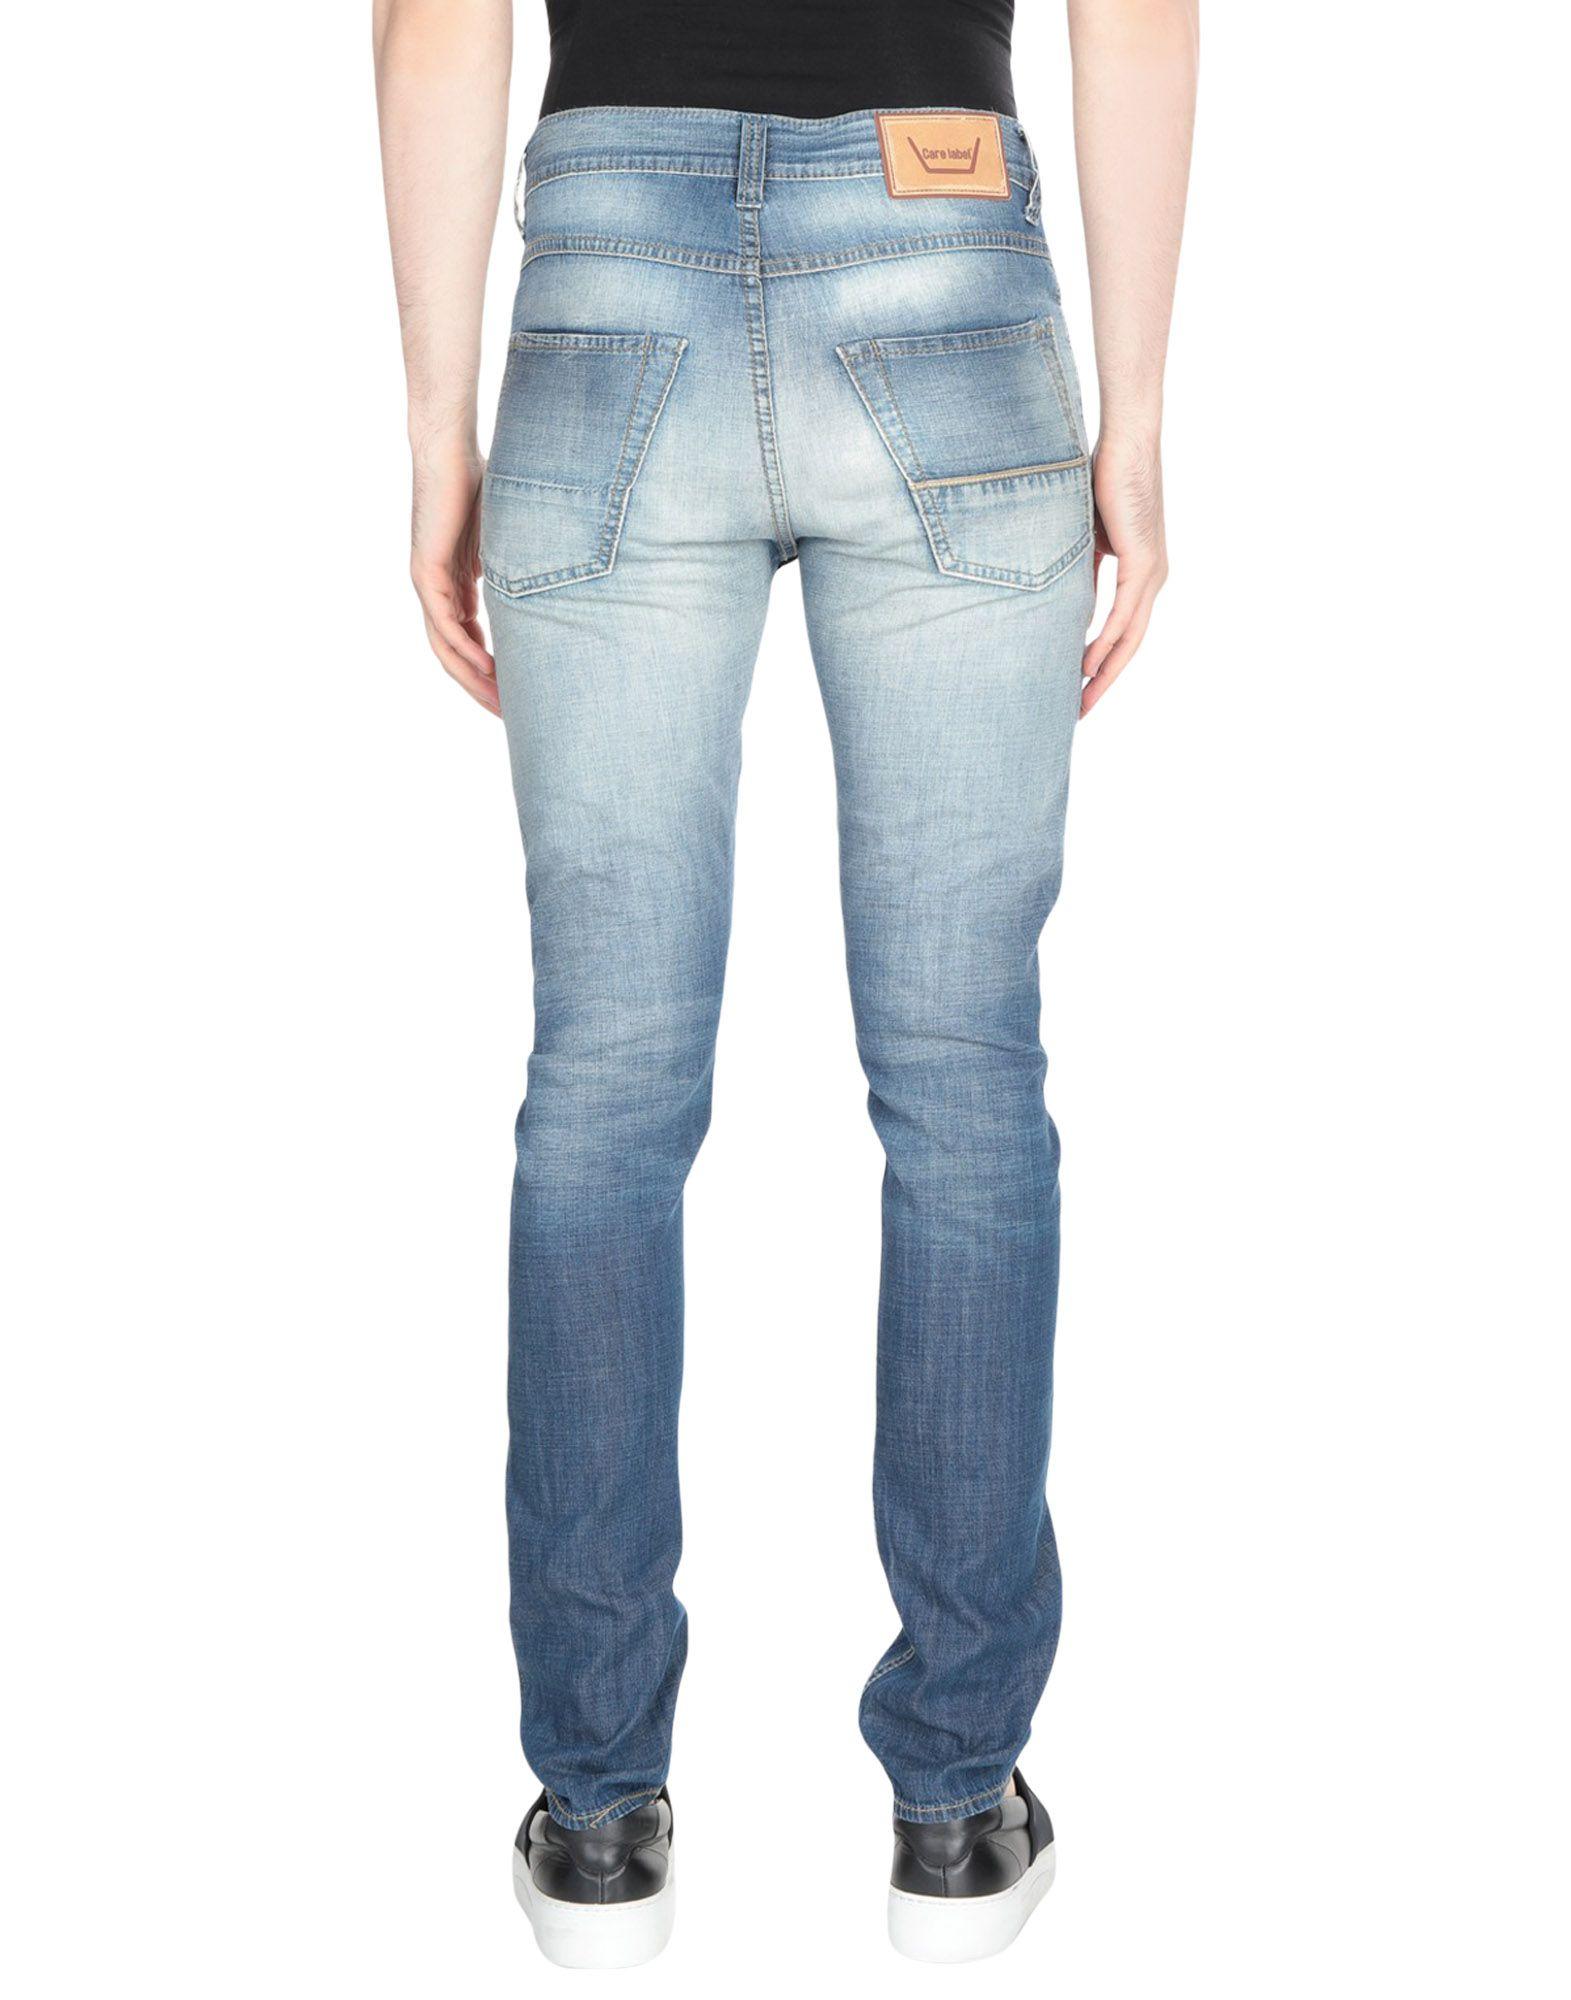 Pantaloni Jeans Uomo Care Label Uomo Jeans - 42685035WE 191403